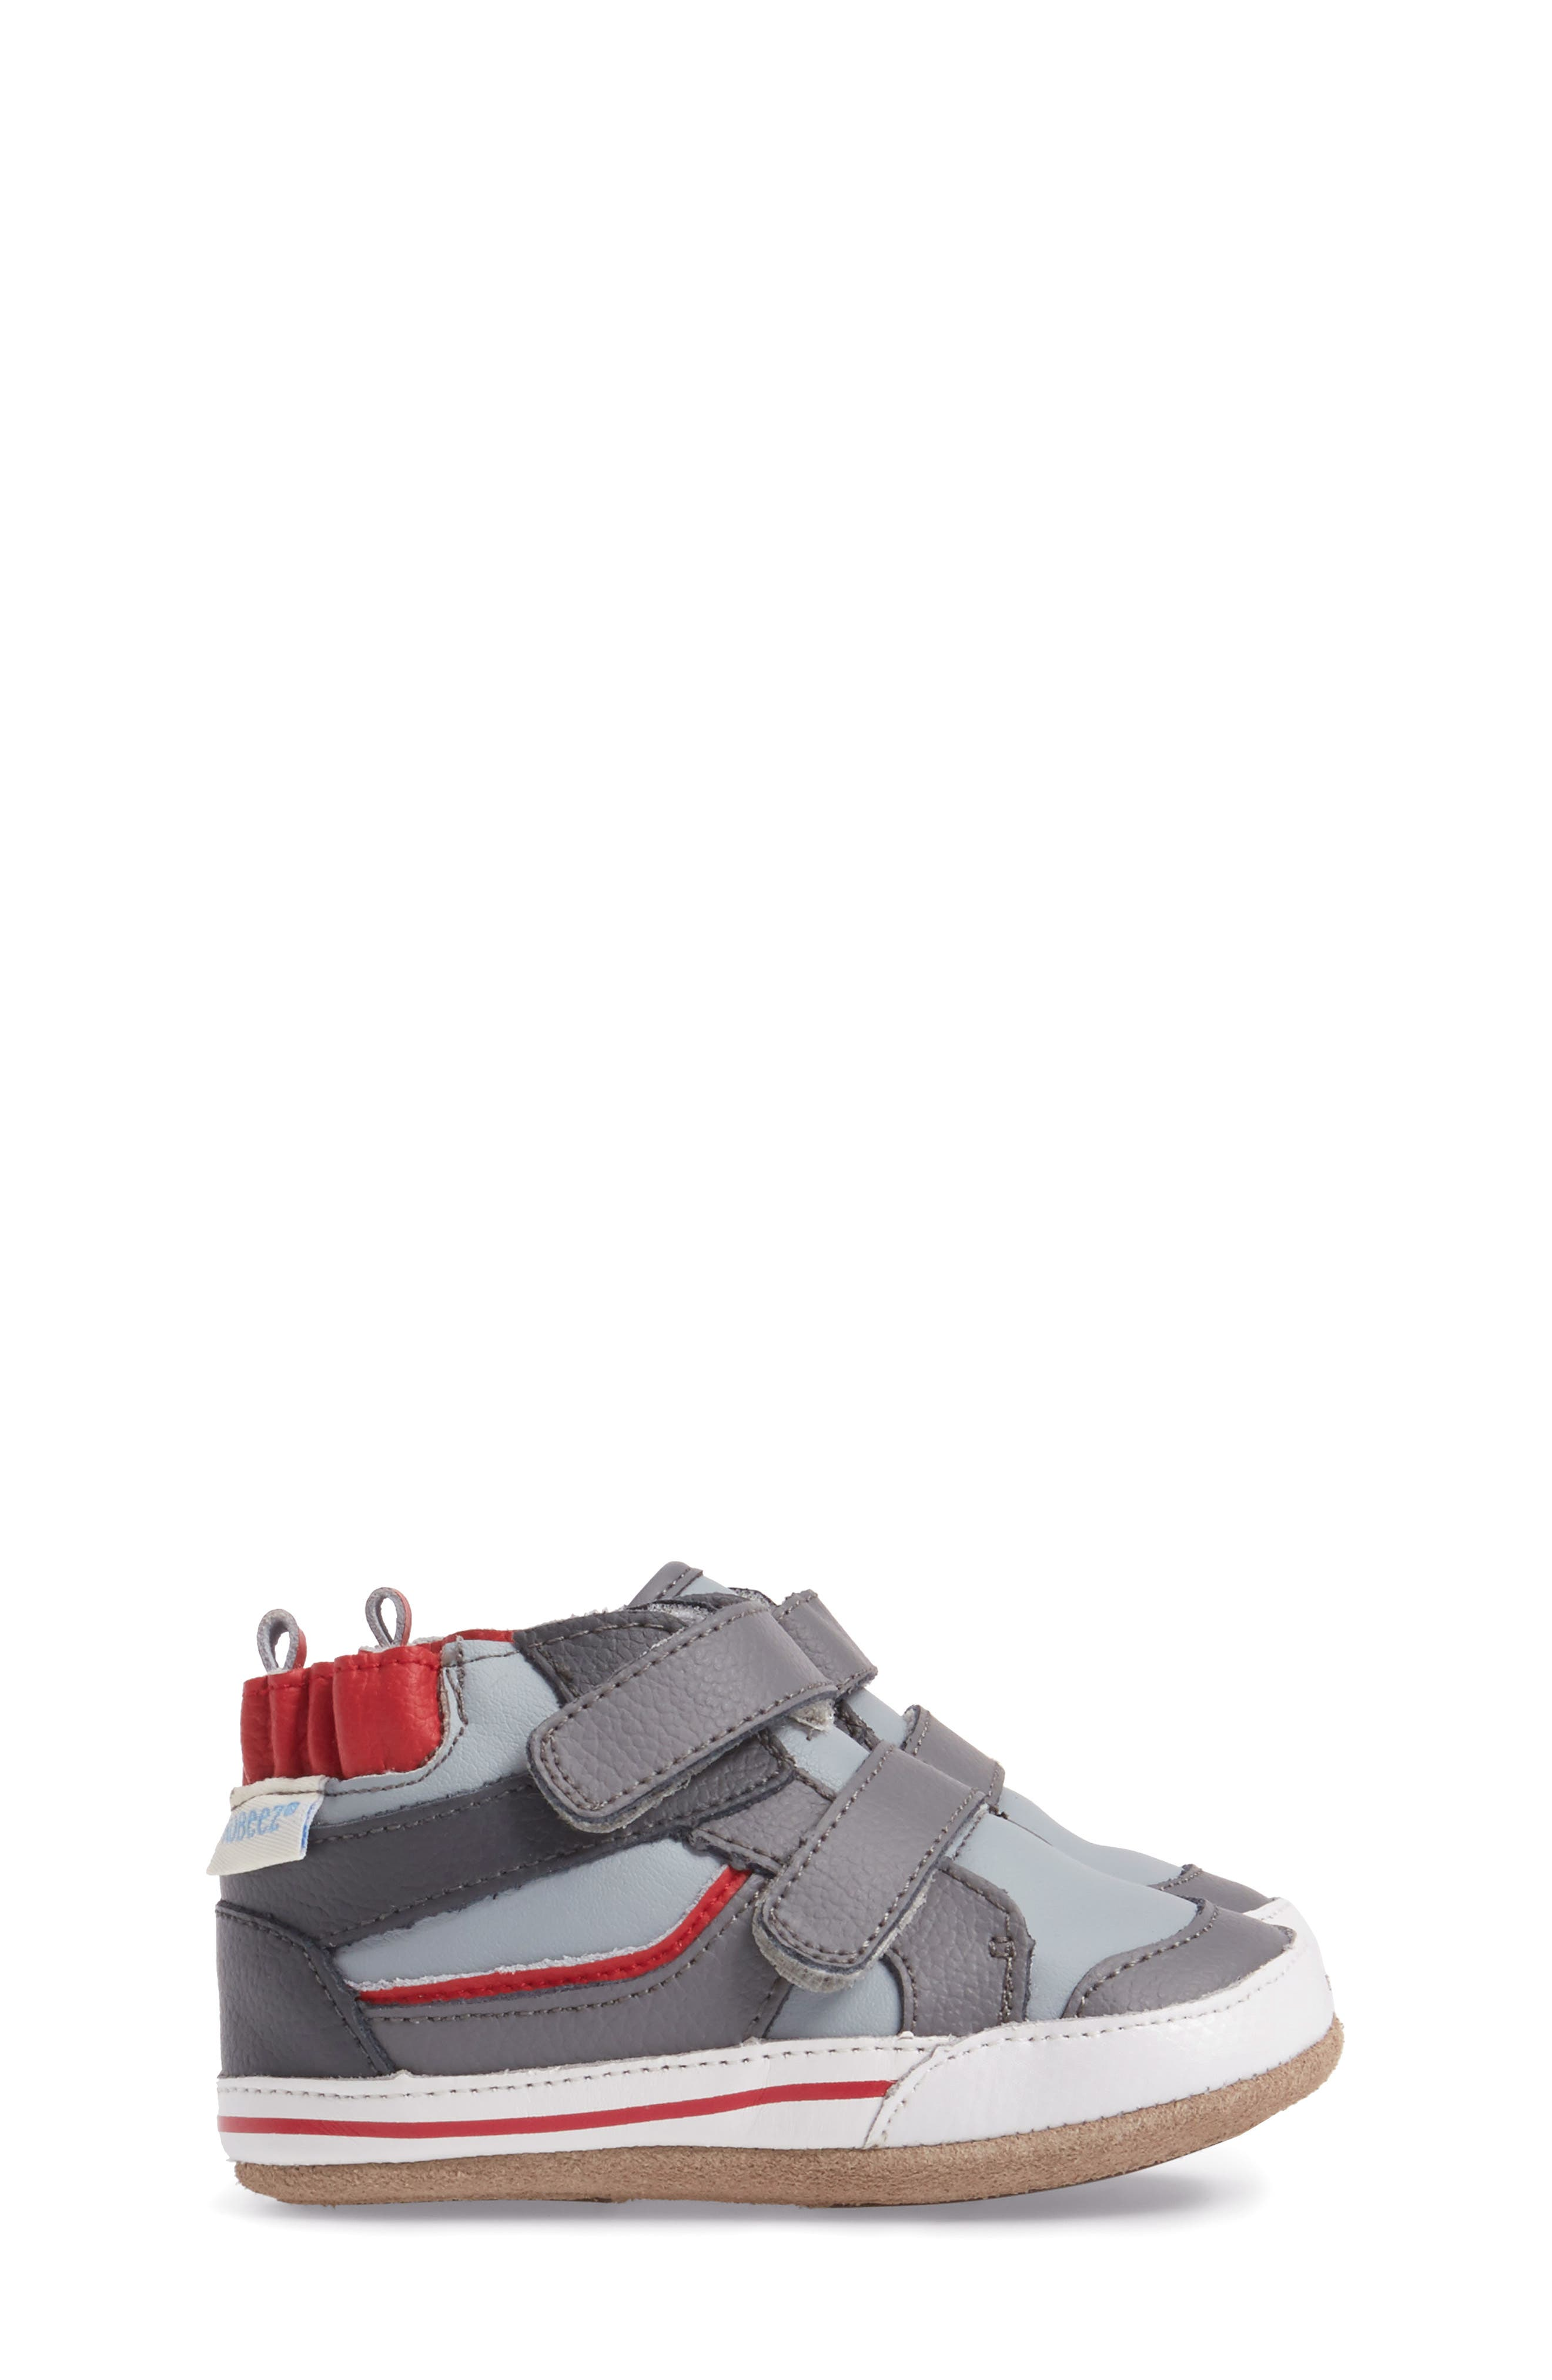 Greg Crib Shoe,                             Alternate thumbnail 3, color,                             020